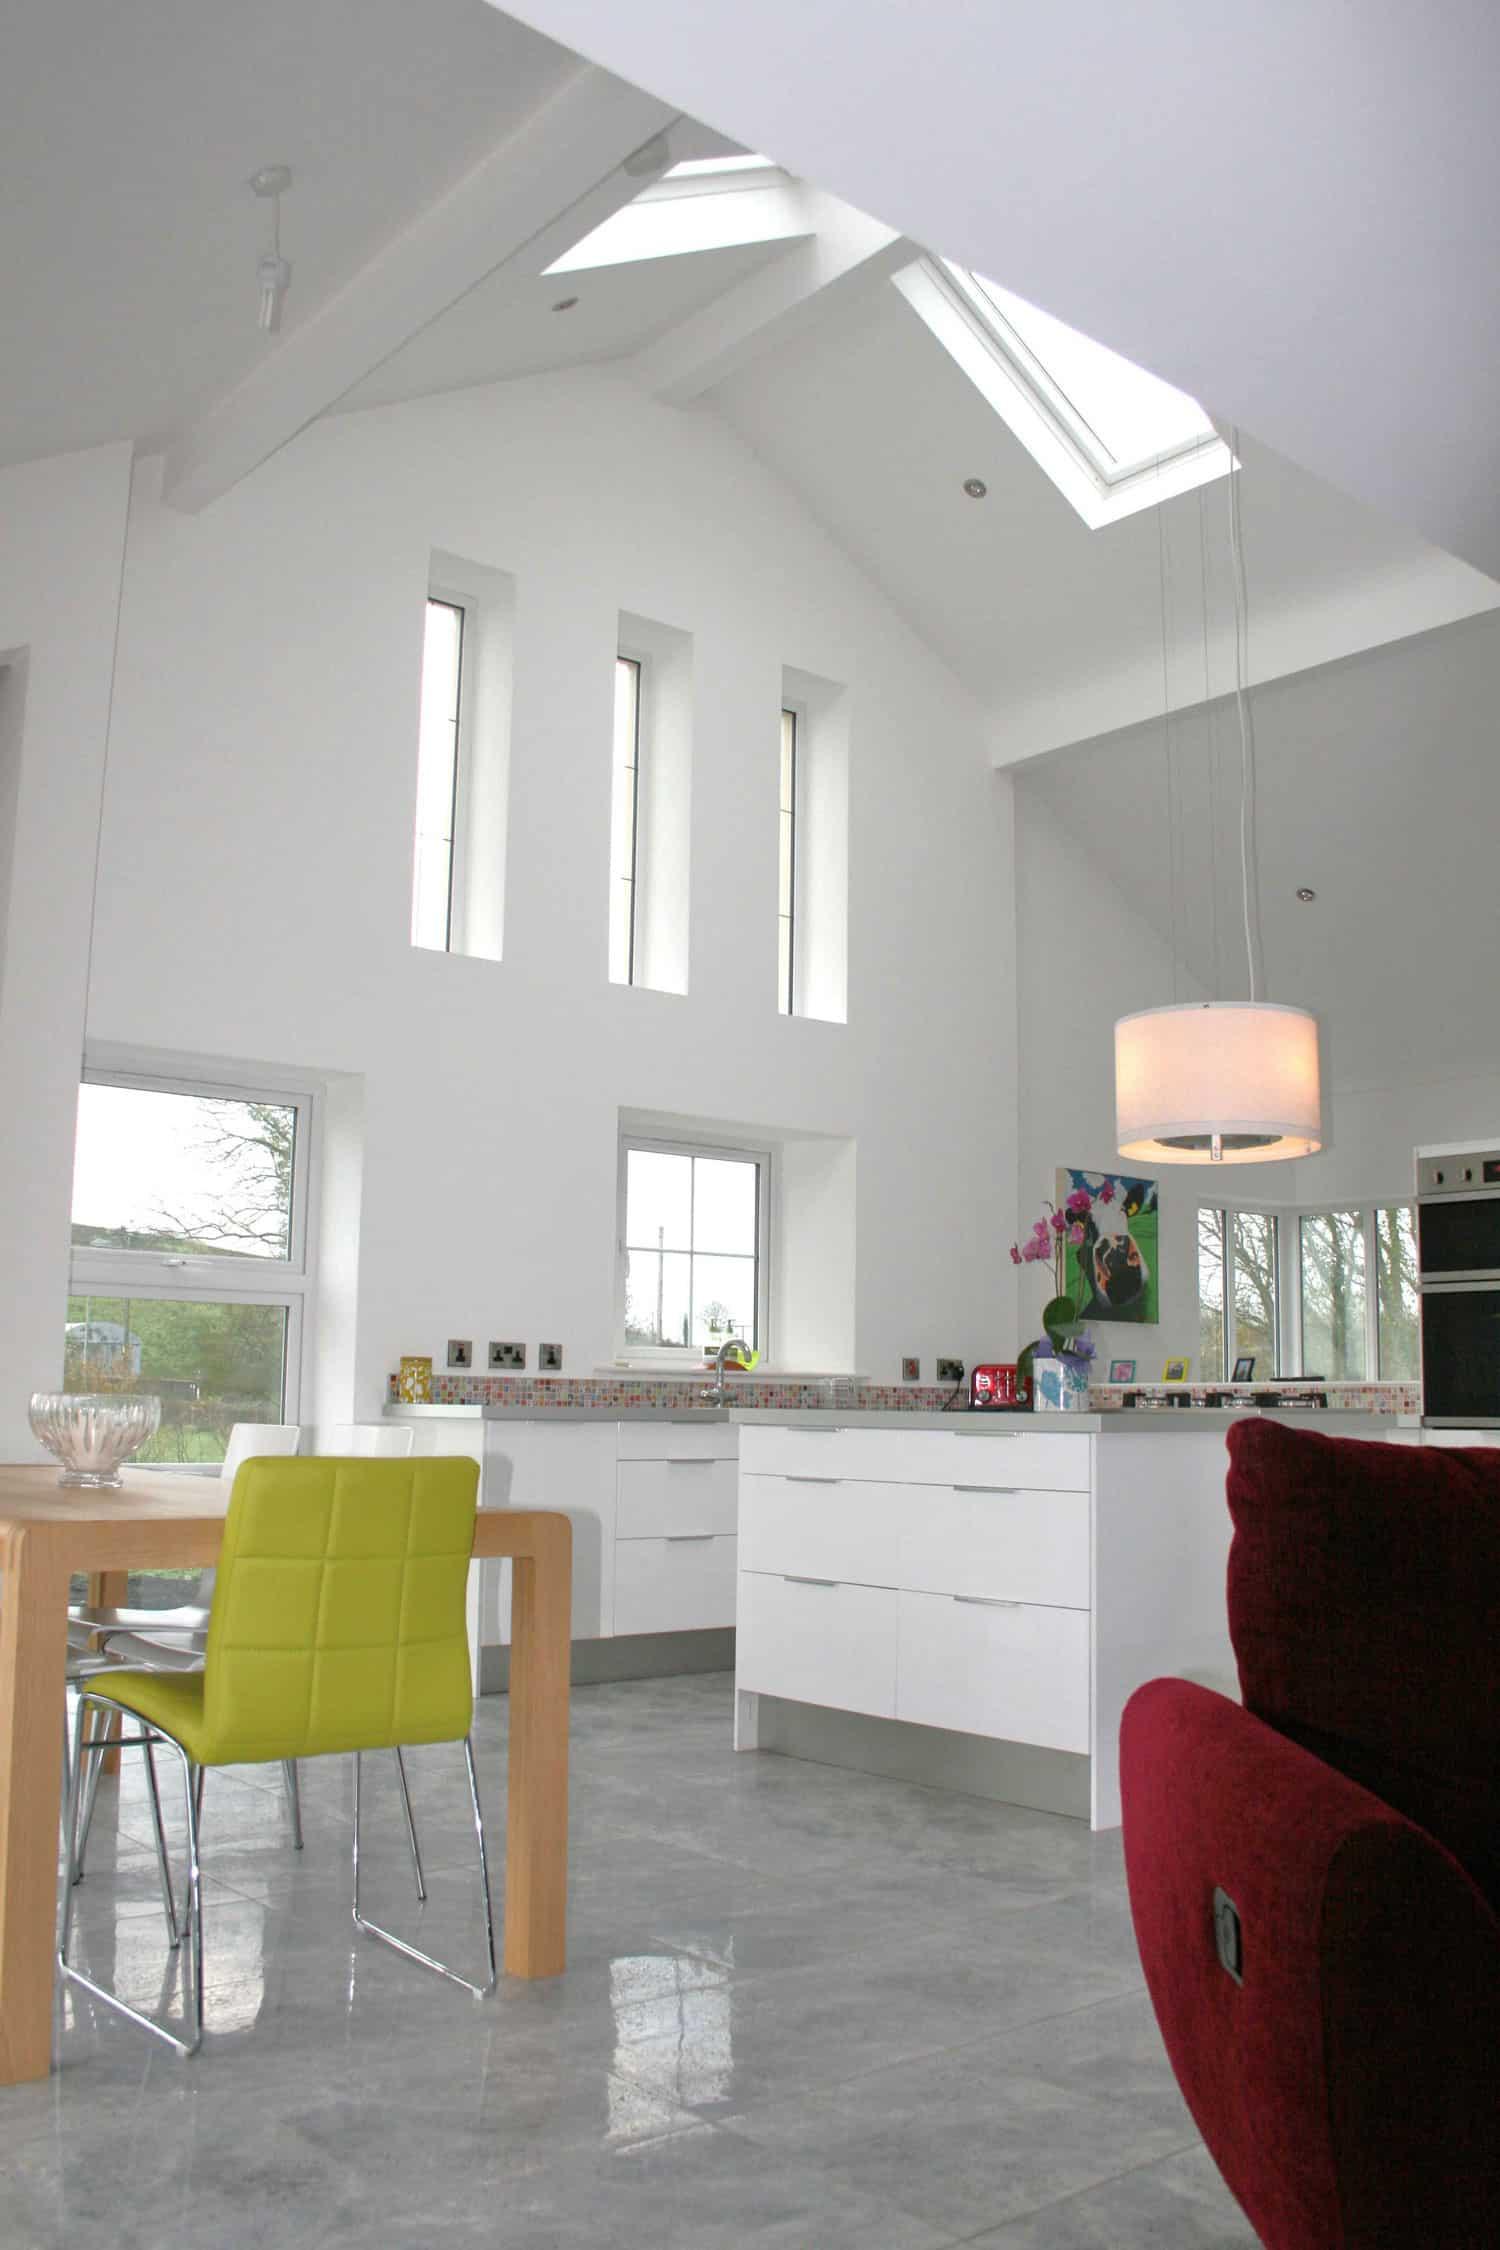 Nagi Dwelling - Internal Kitchen Vaulted Ceiling